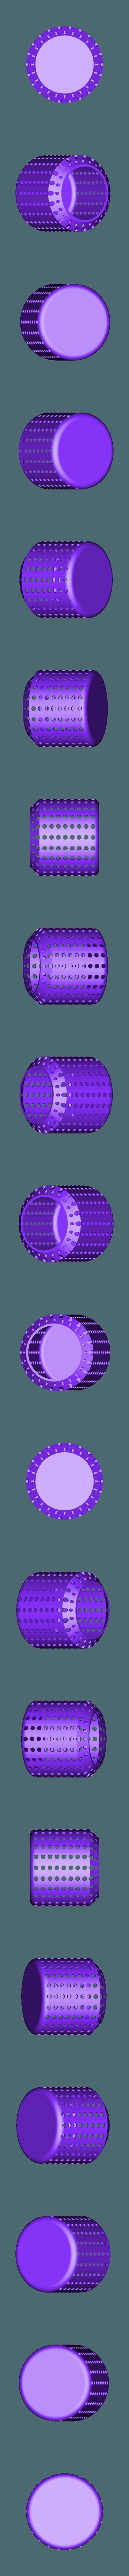 Aquarium-planter-big.stl Download free STL file Aquarium planter • 3D printing design, Pator12